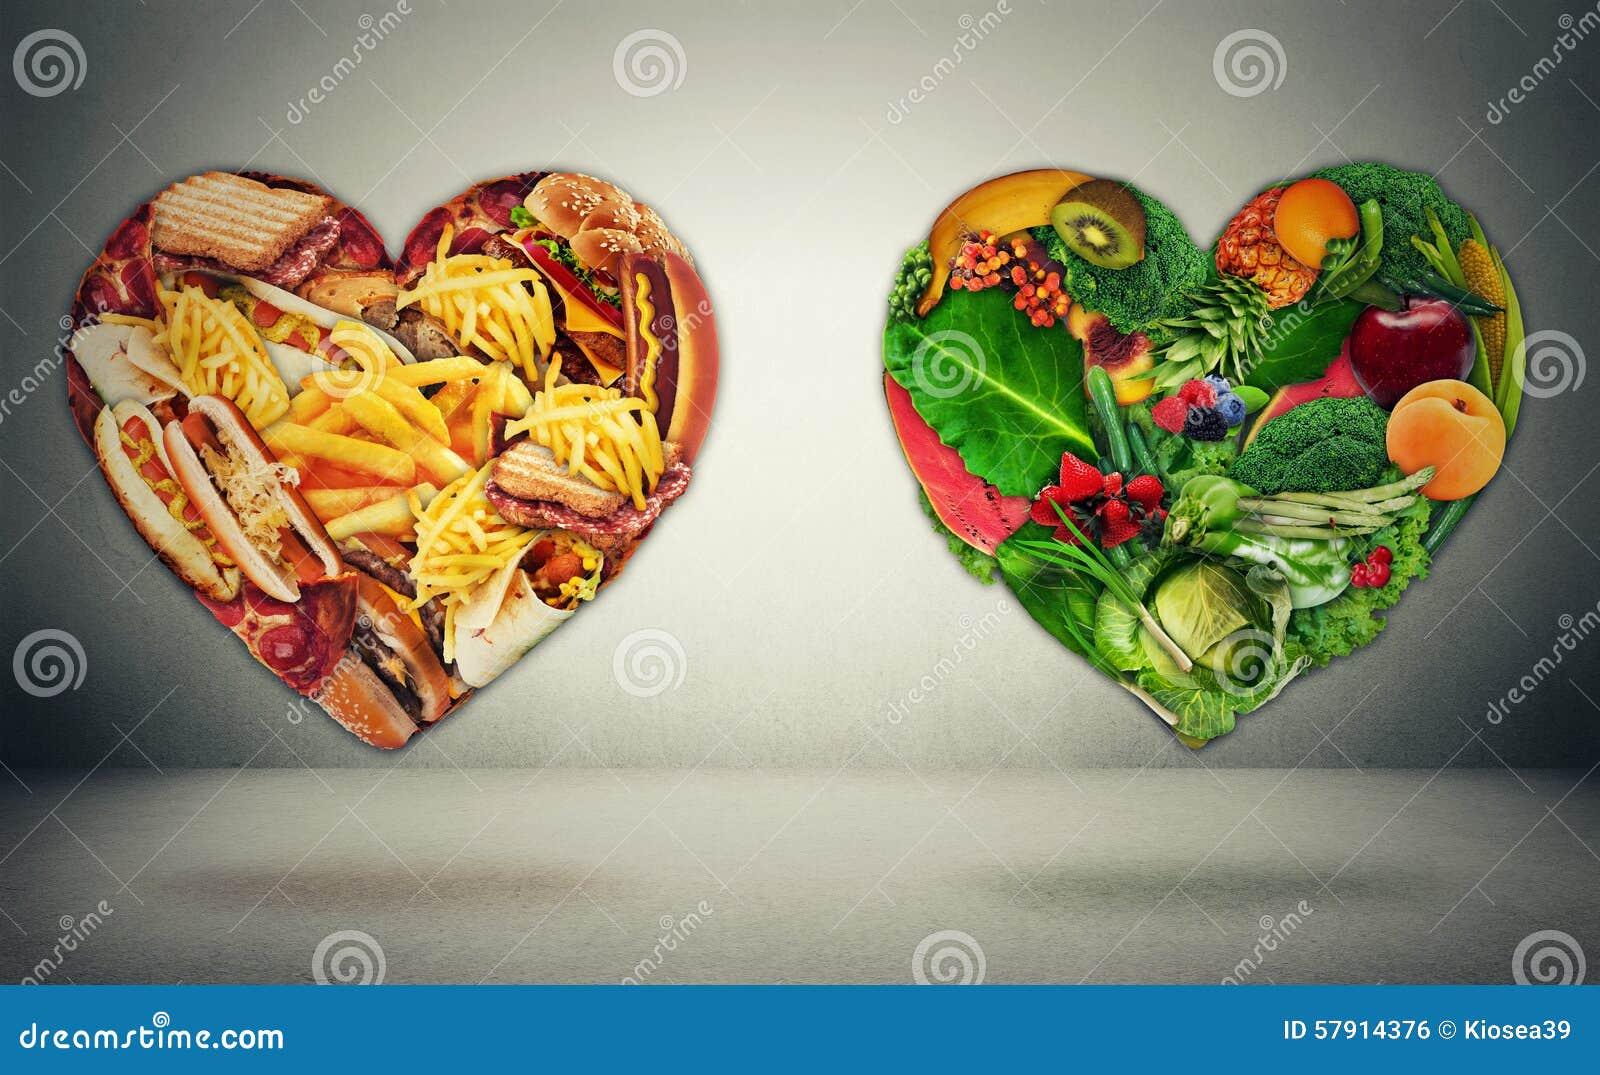 Diet choice dilemma and heart health concept